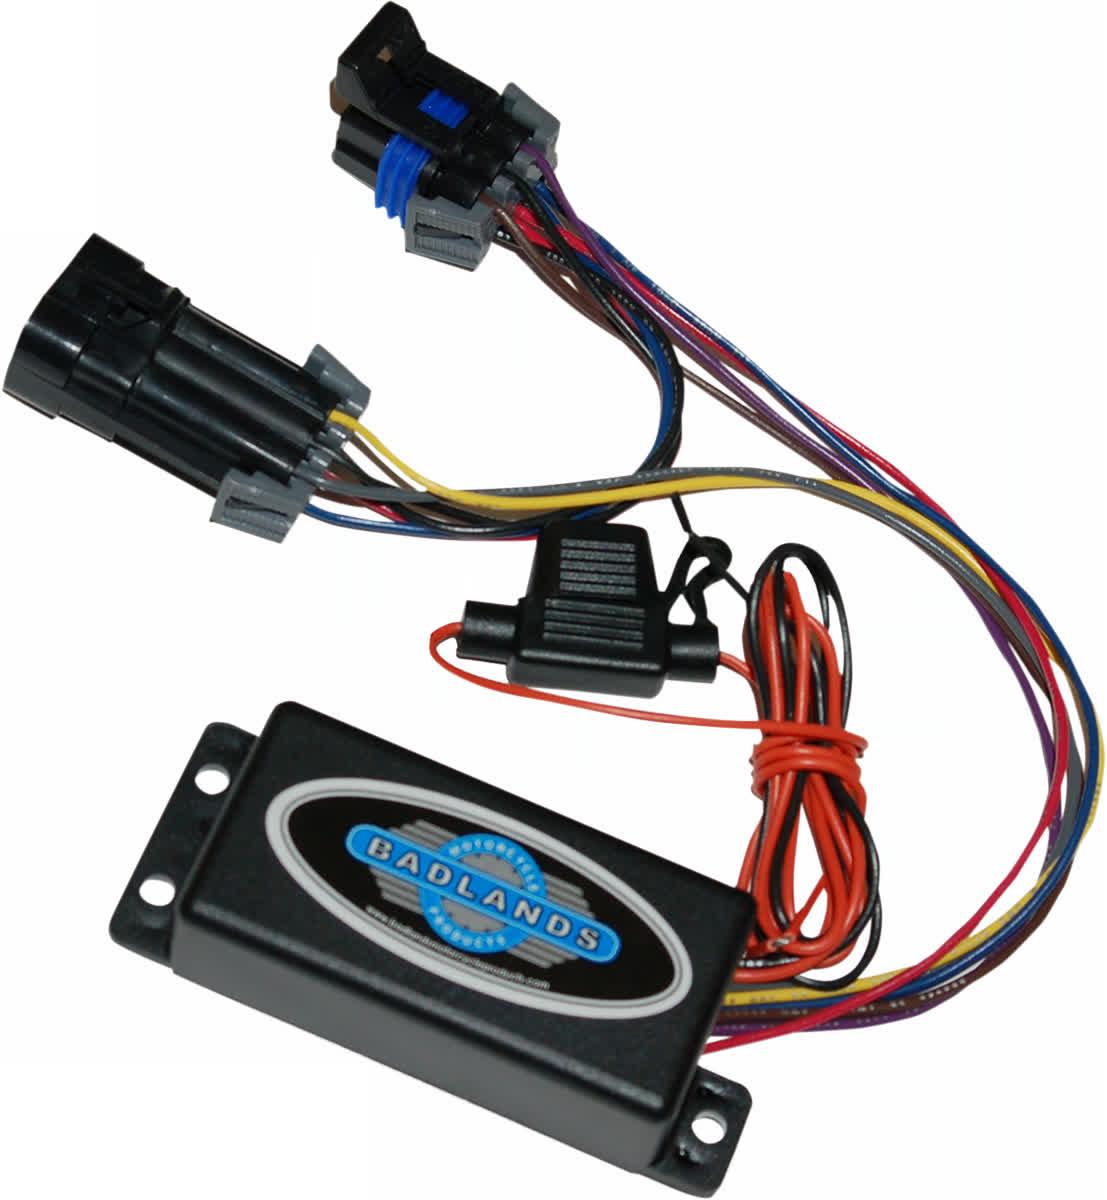 Badlands ILL-VIC-03 Plug-In Style Illuminator